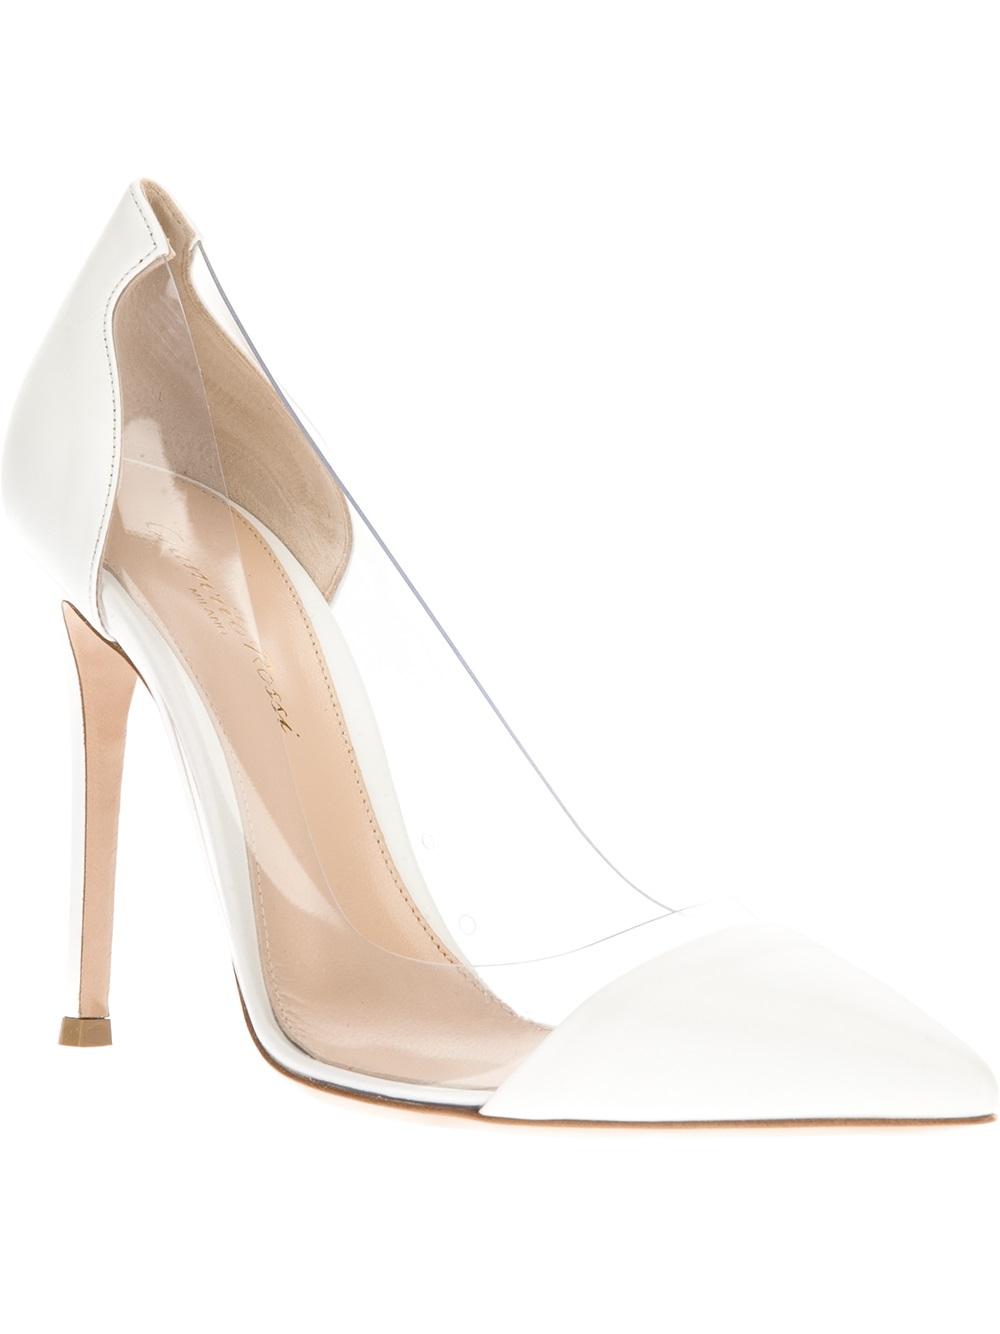 Gianvito Rossi Woman Shyla Suede And Perspex Sandals Black Size 40 Gianvito Rossi kpkWNc